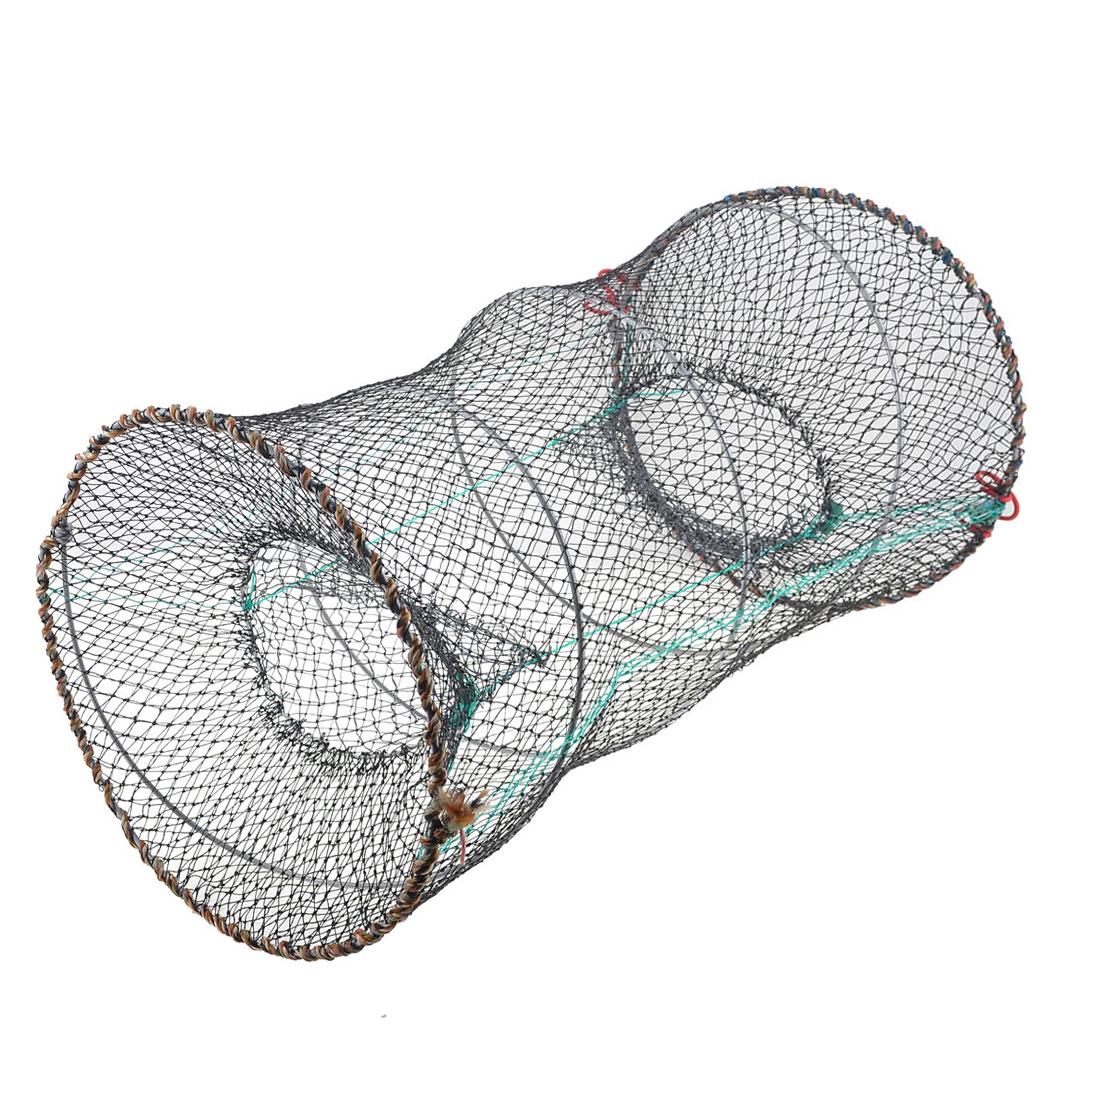 60cm High Spring Wire Frame Lobster Crawfish Crab Black